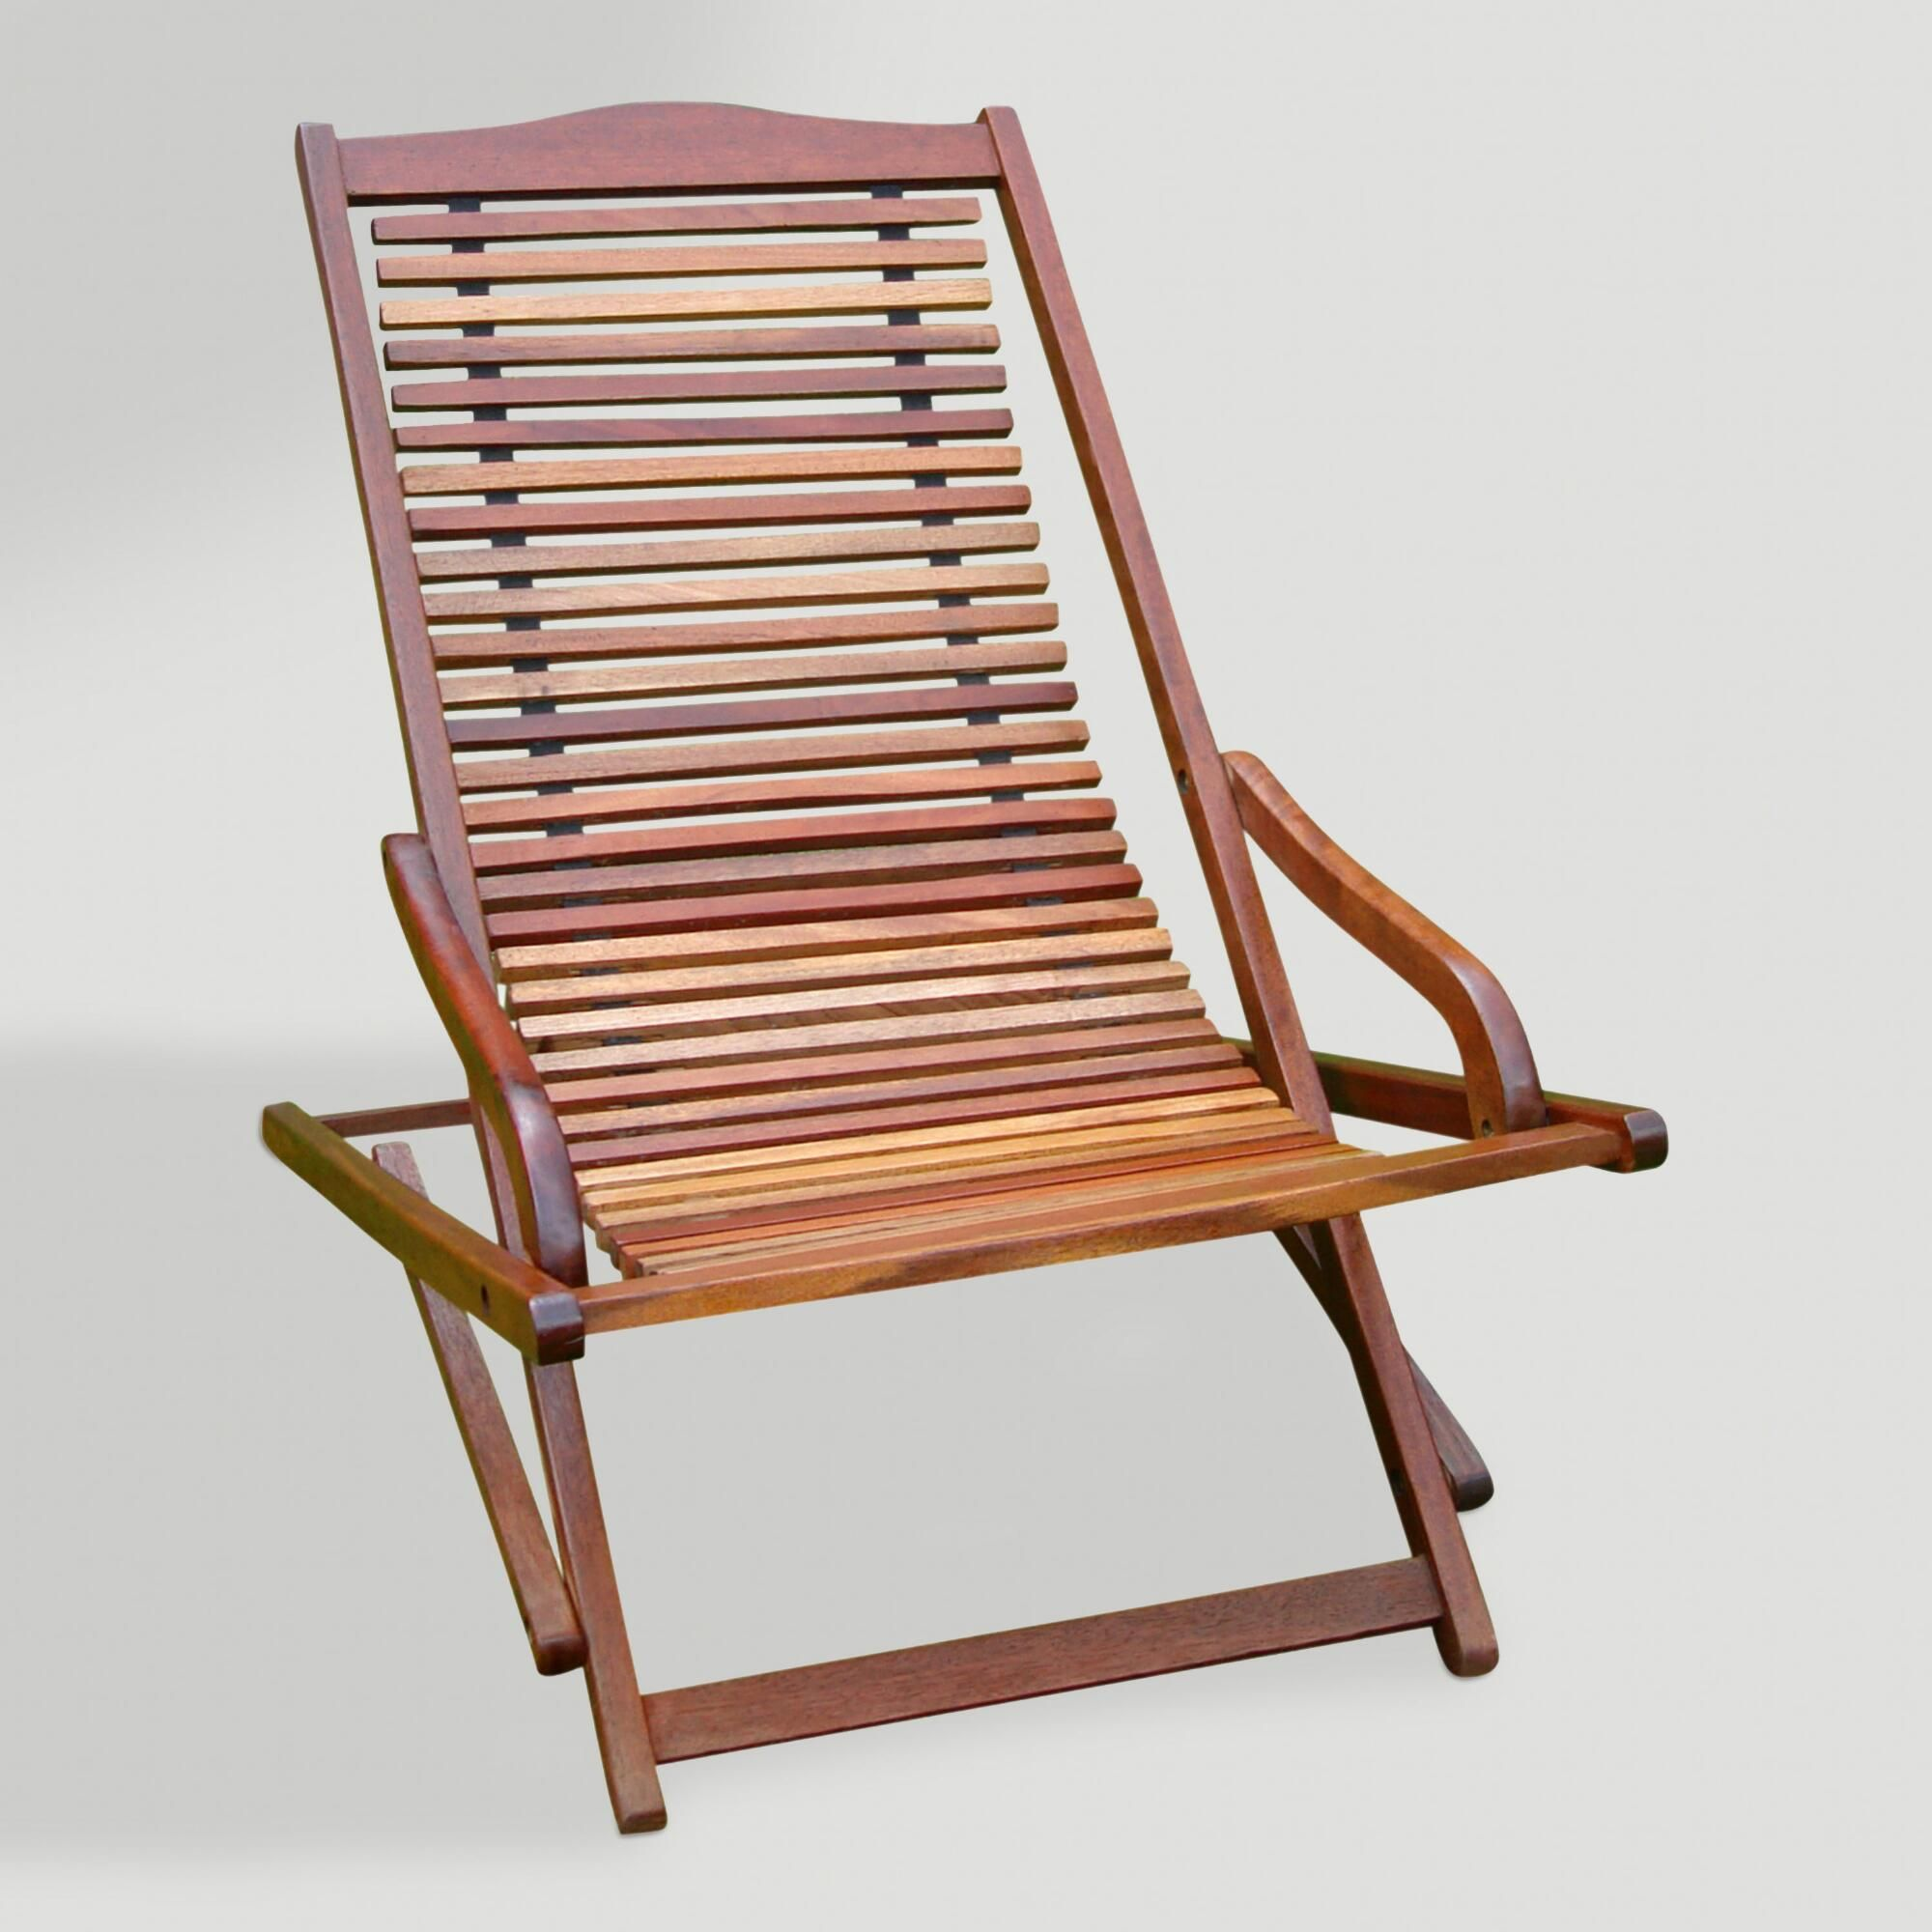 Patio Folding Chaise Lounge Cadeiras Ao Ar Livre Lounge Ao Ar Livre Cadeiras De Gramado